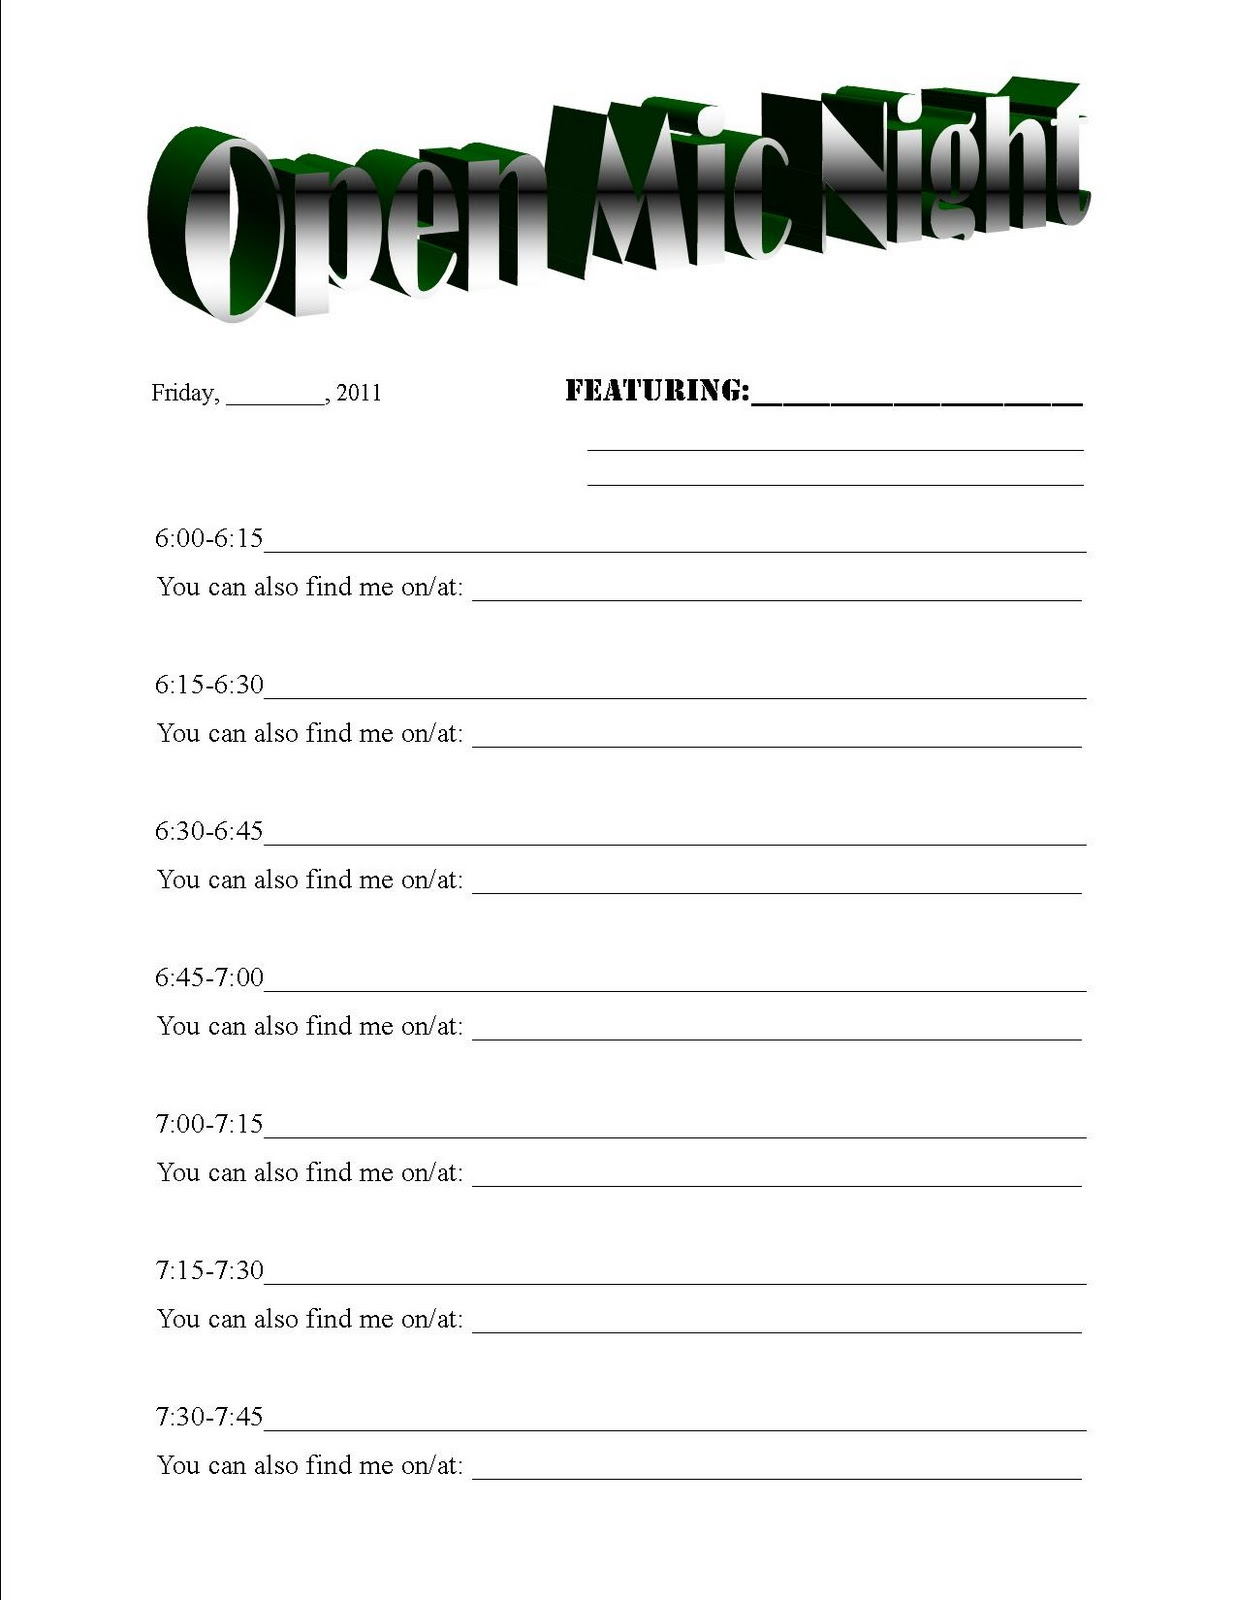 Sign Up Sheet Template, Sports Sign Up Sheet Template, Sign Up Sheet ...